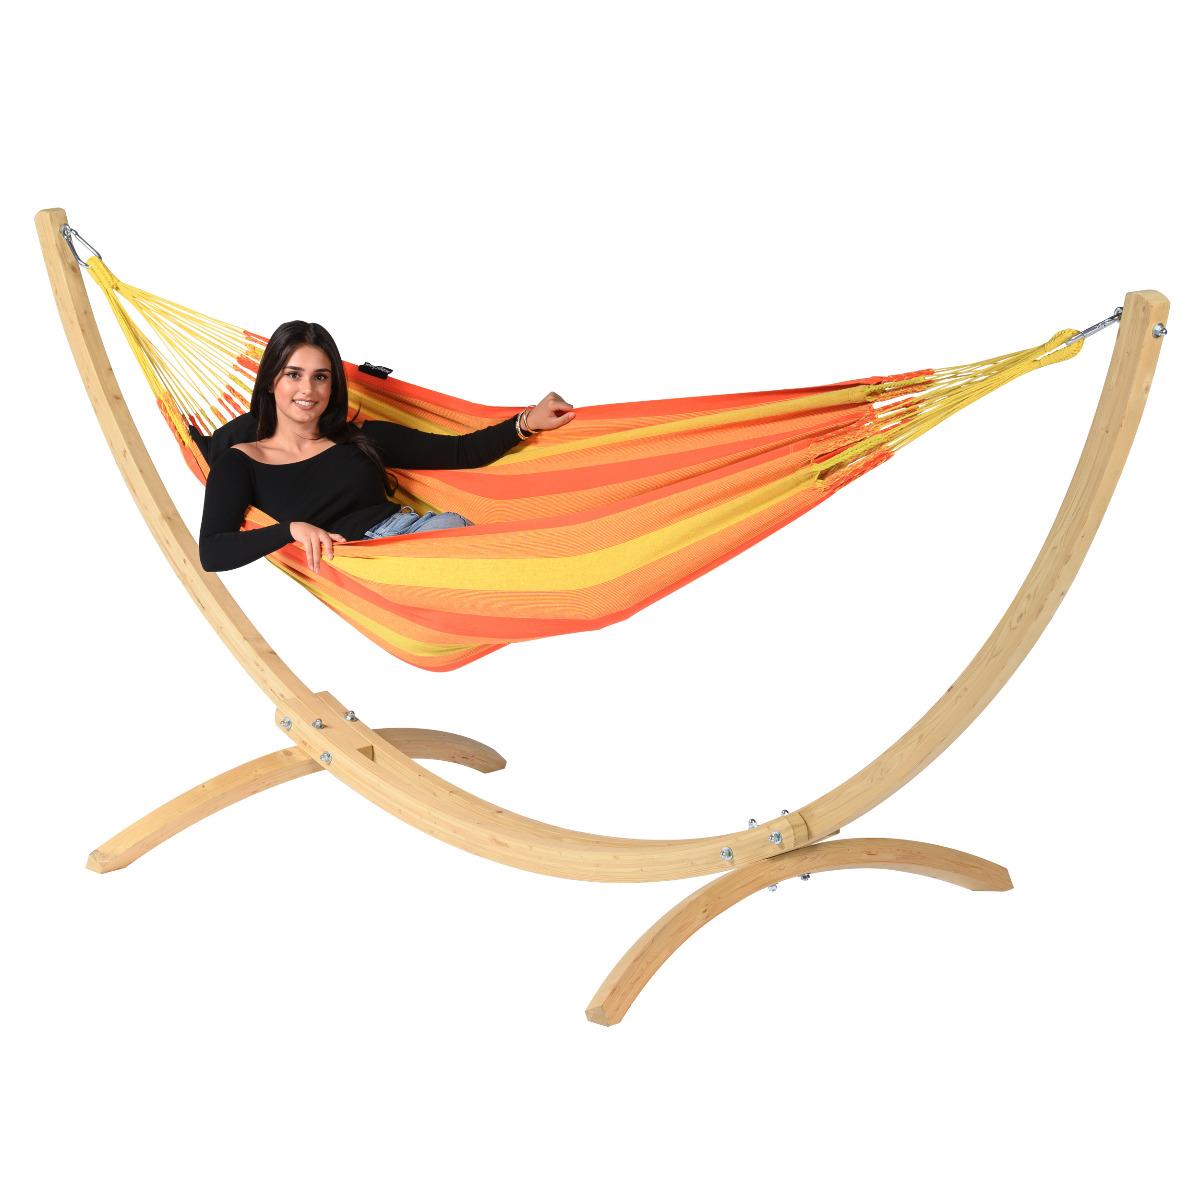 Hangmatset Single 'Wood & Dream' Orange - Tropilex �